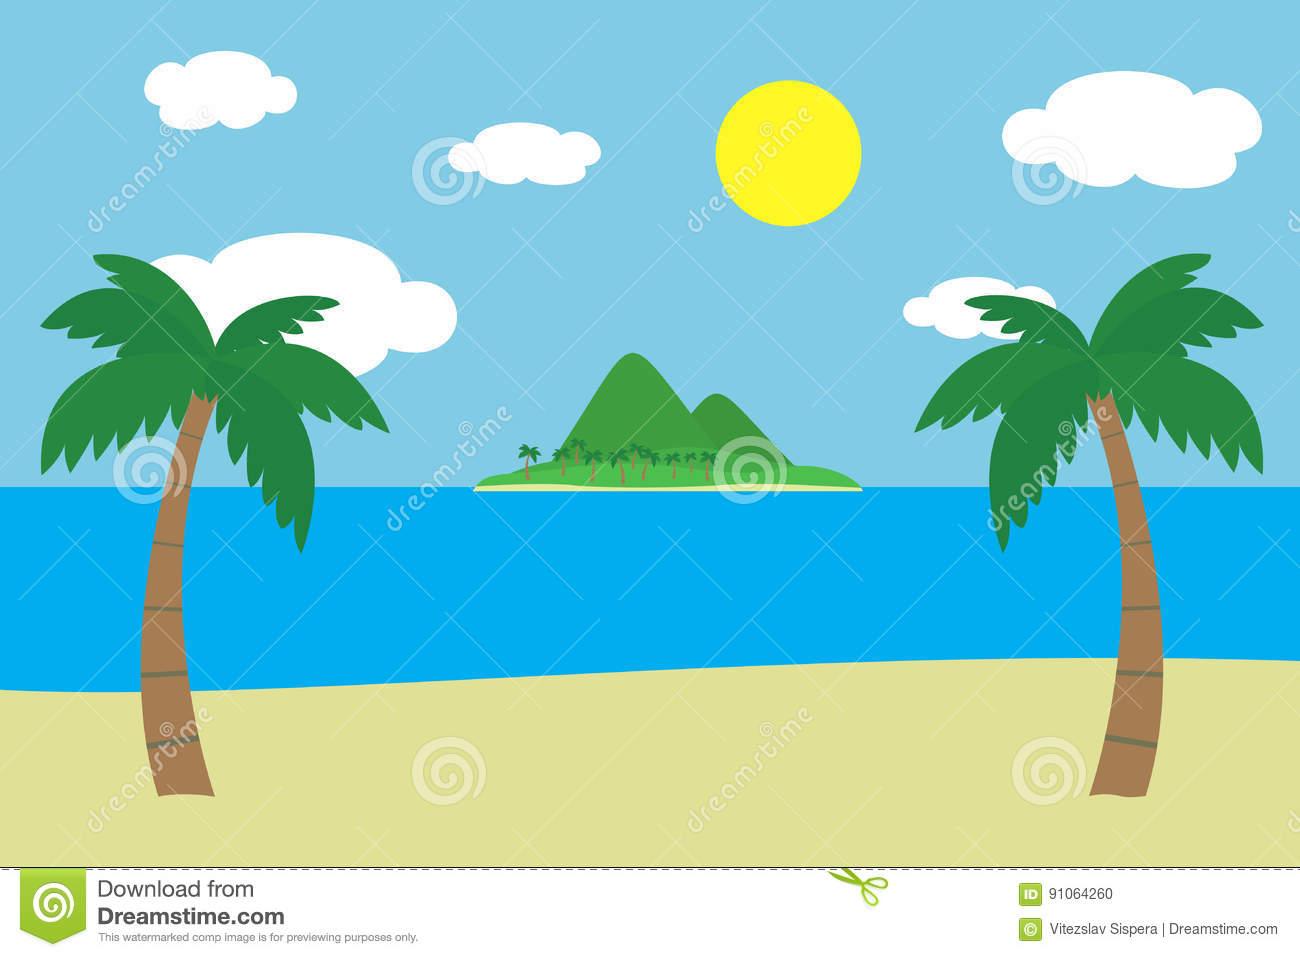 Beach clipart sandy beach, Beach sandy beach Transparent.